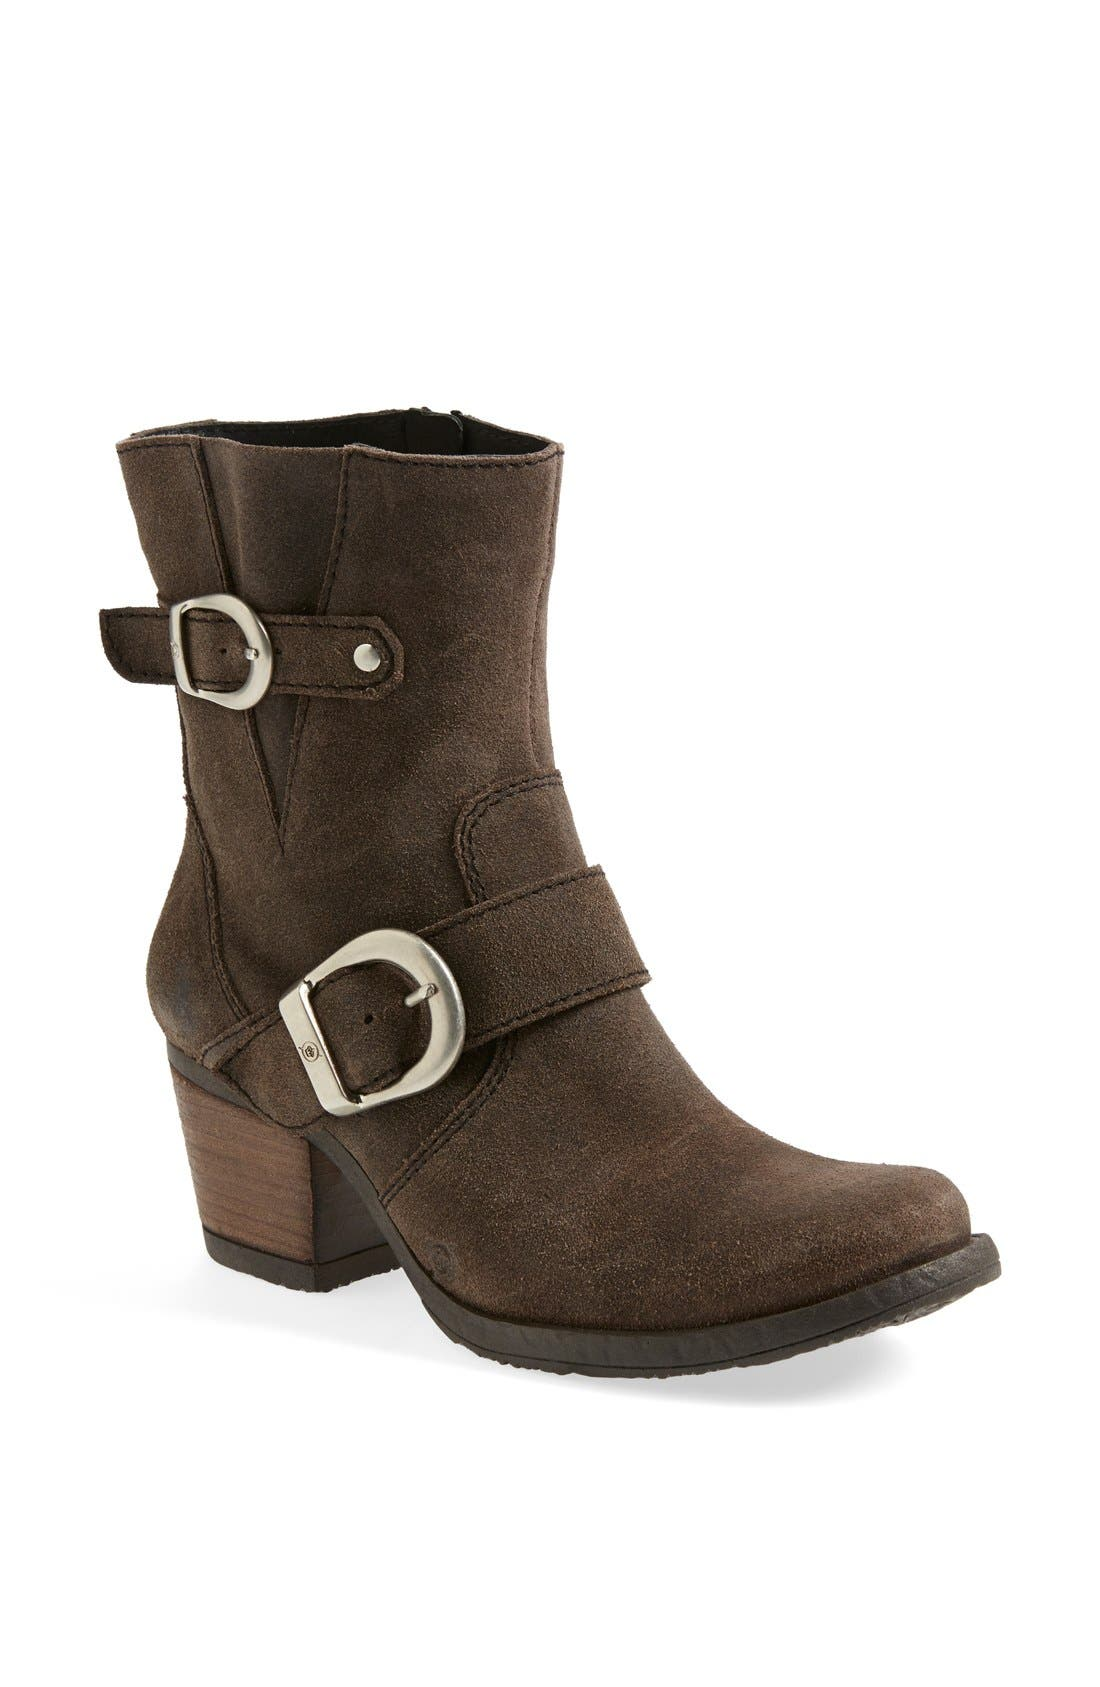 Alternate Image 1 Selected - Børn 'Galene' Boot (Online Only) (Women)